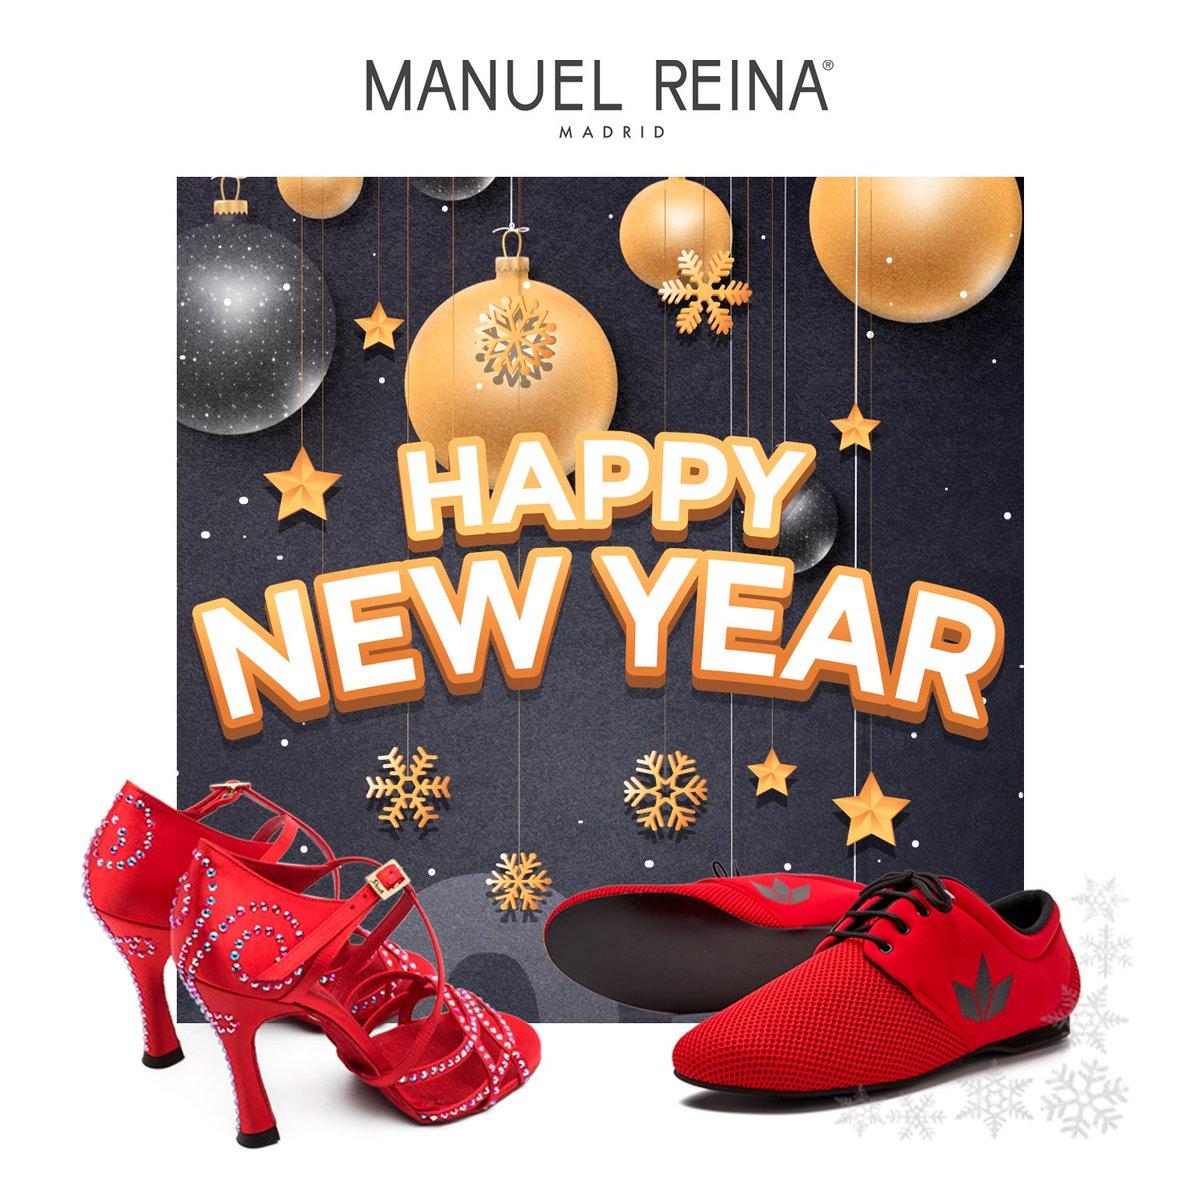 Happy New Year 2020  • • #newyear #happynewyear #новыйгод2020 #новыйгод #cristmas #сновымгодом #елка #ёлка #скороновыйгод #newyearseve #рождество #newyearscelebration #newyearsparty #dec31 #jan1 #christmastree #newyears #merrychristmas #newyearsday #Christmaspic.twitter.com/GKPleVSpZT